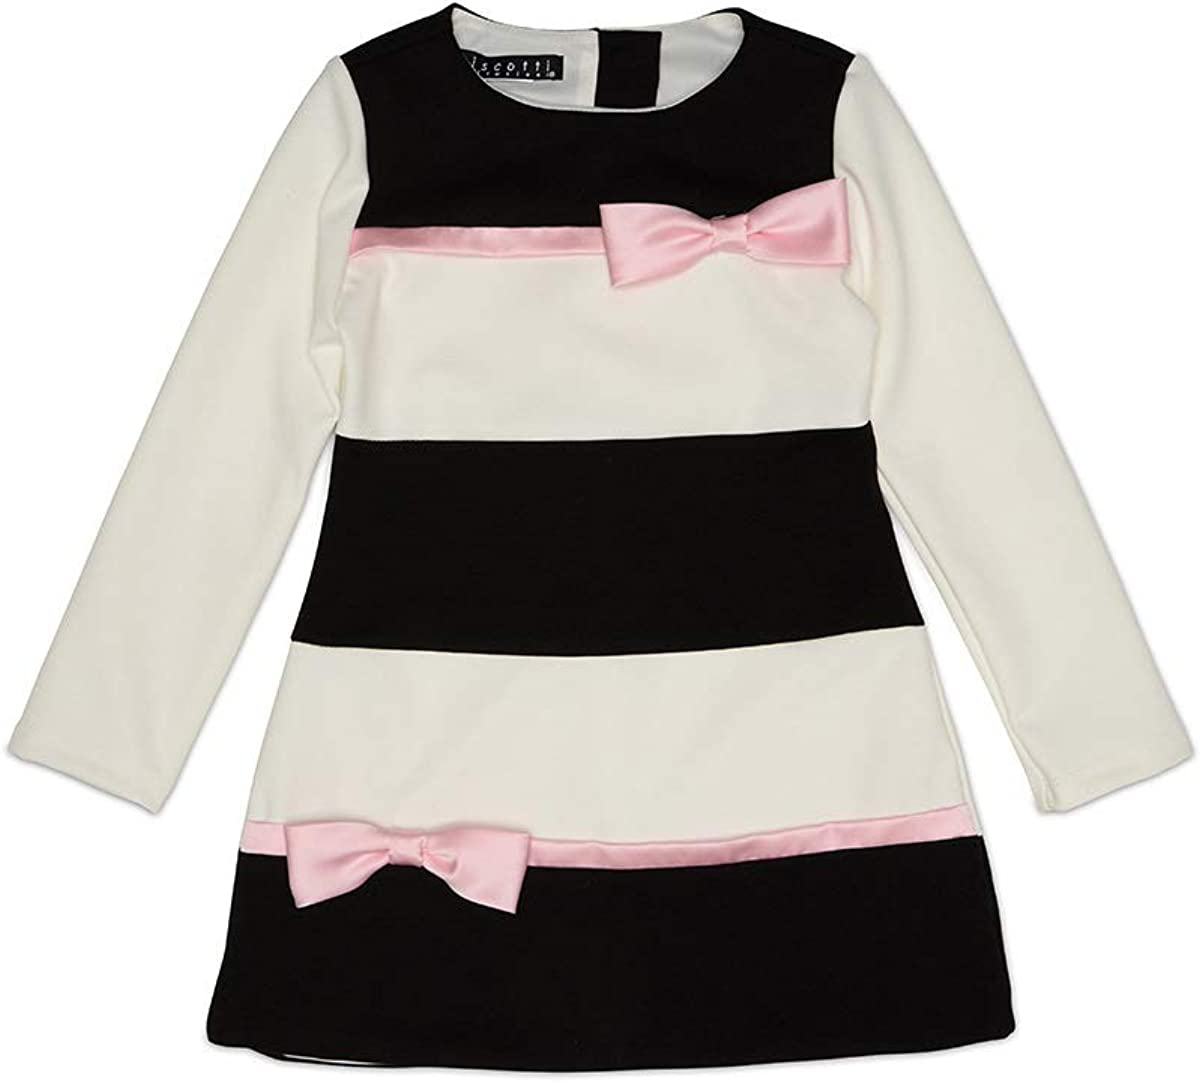 Biscotti 106 Modern Beauty Dress w/Bows